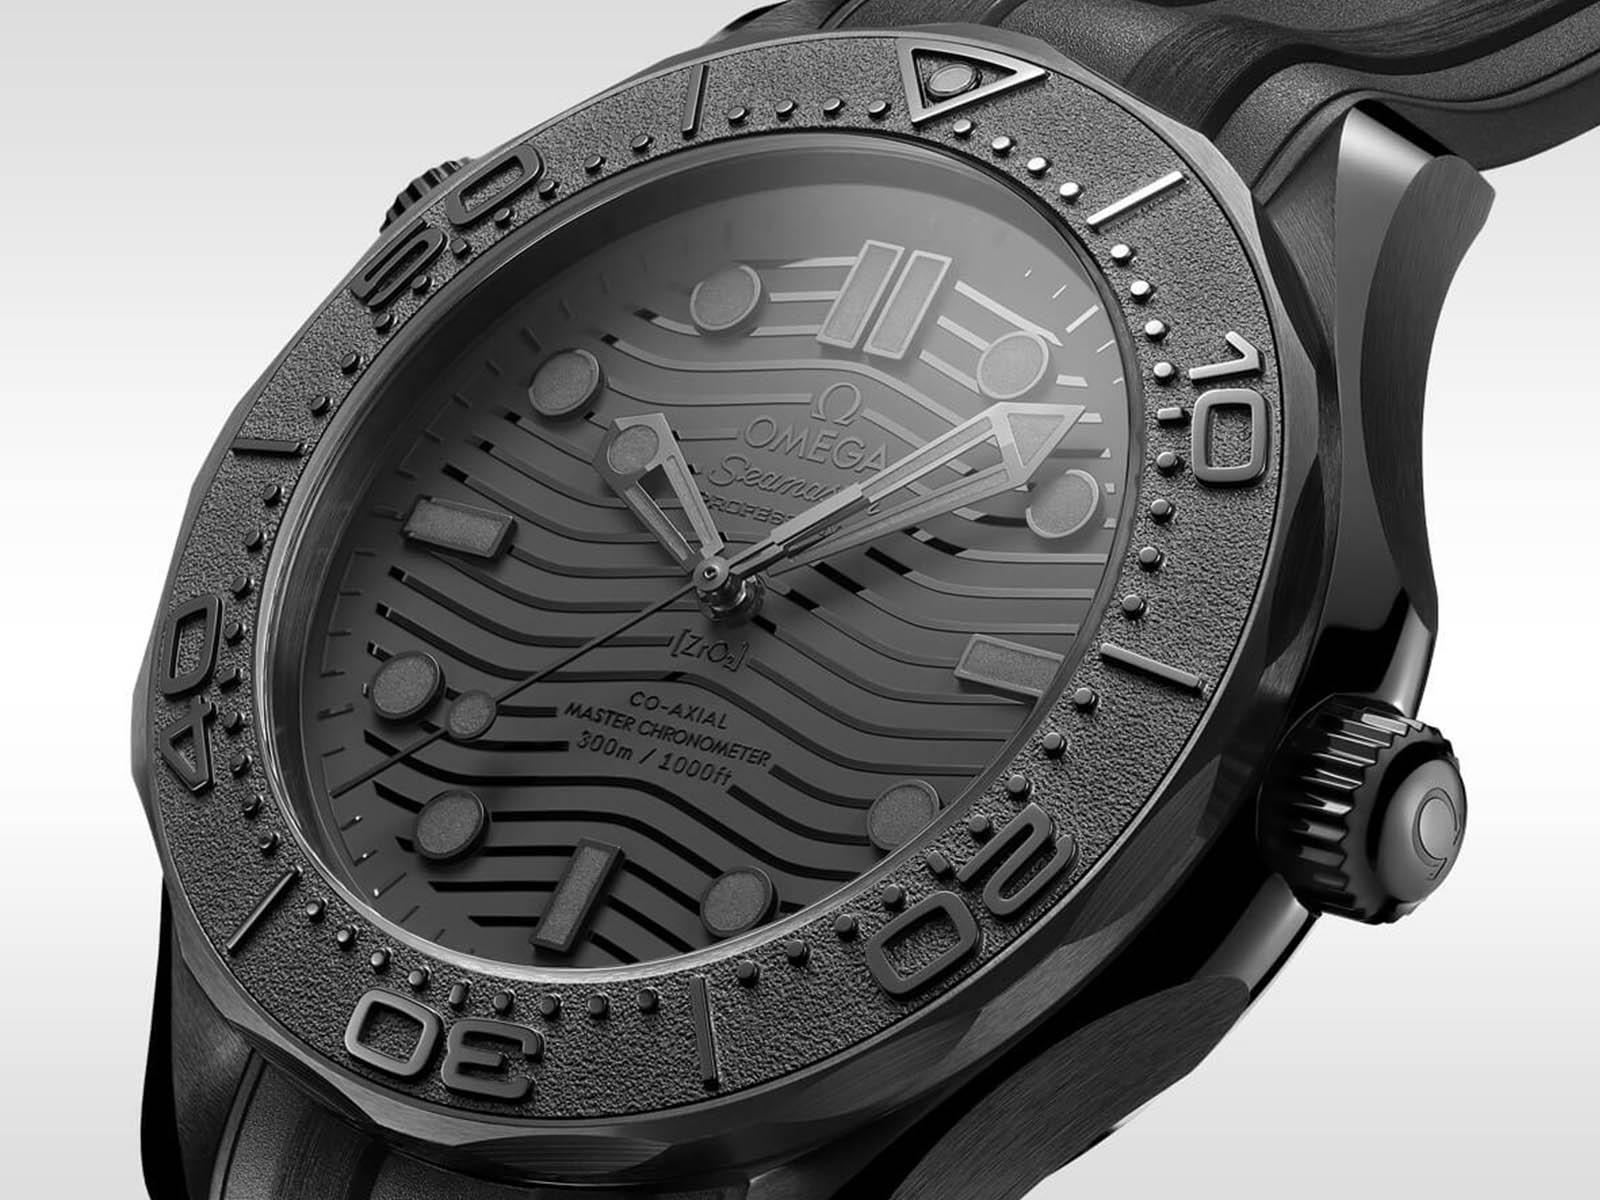 210-92-44-20-01-003-omega-seamaster-300-diver-black-black-2.jpg